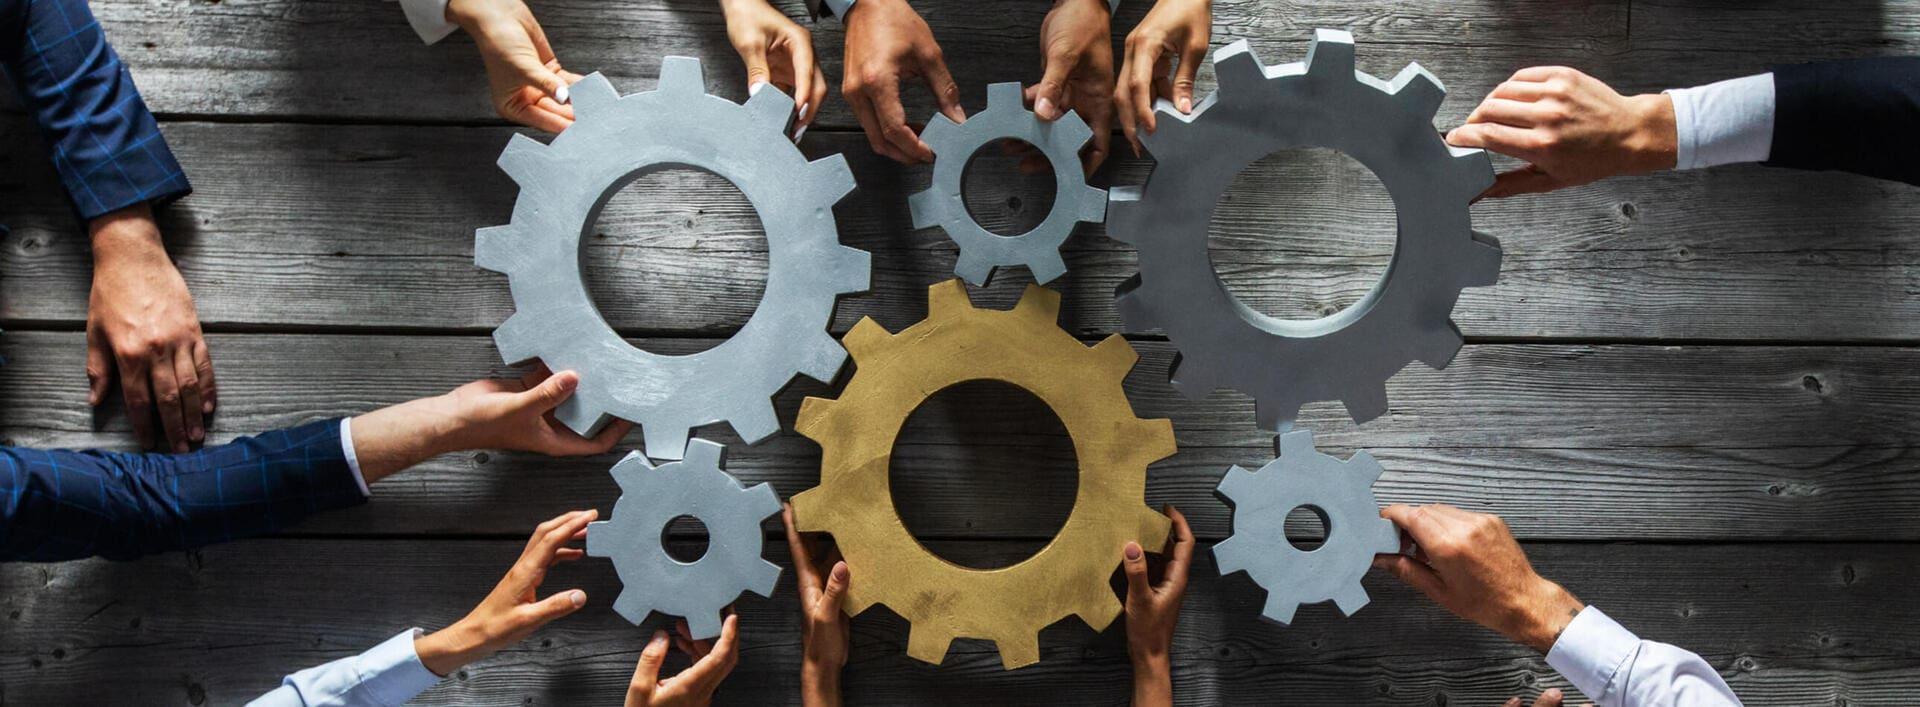 Organisationsberatung Change Management Beratung